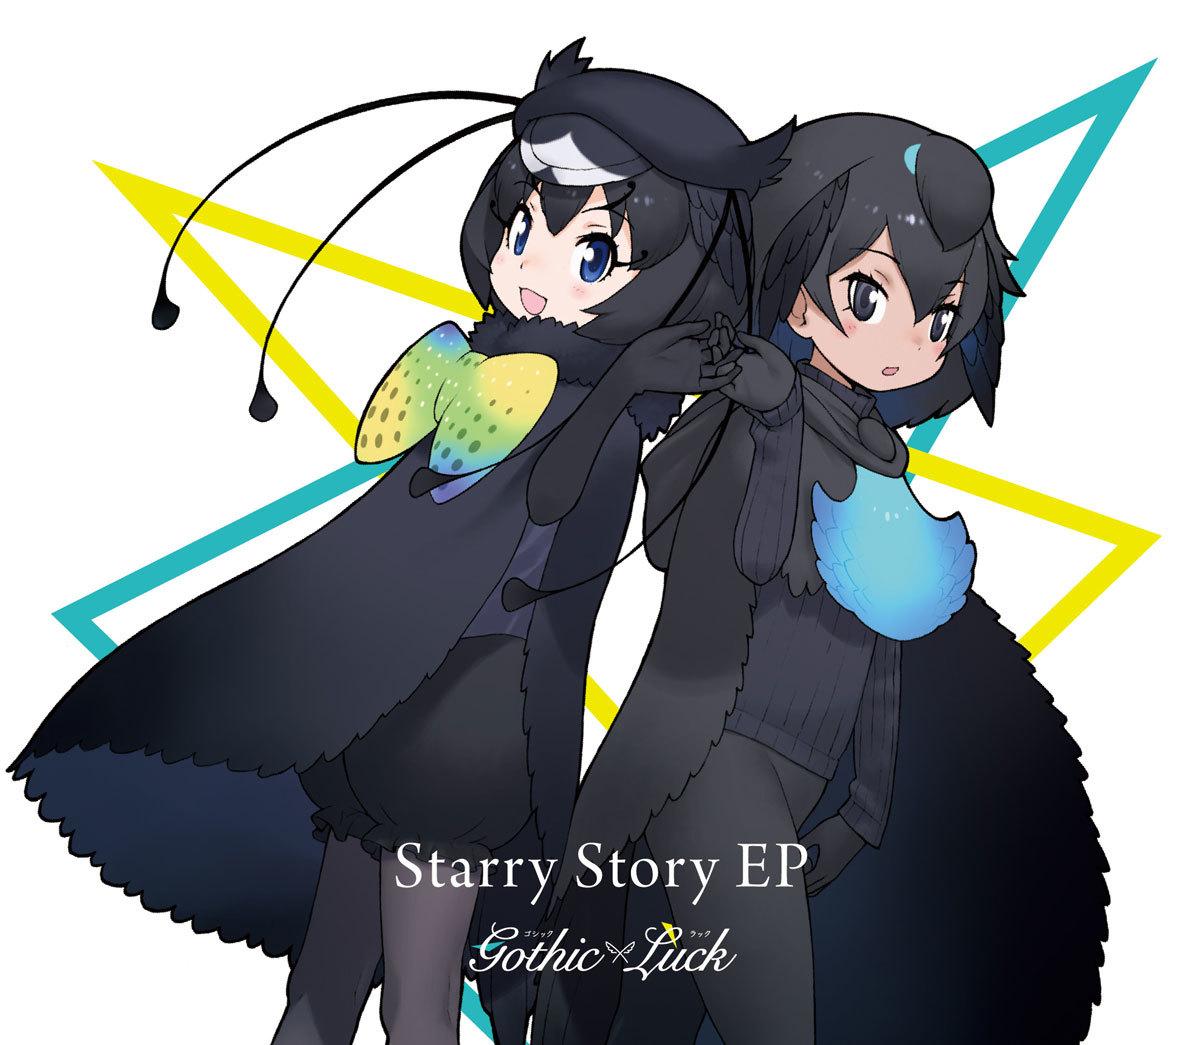 Gothic×Luck「Starry Story」 EP けものフレンズ盤 (C)けものフレンズプロジェクト2A